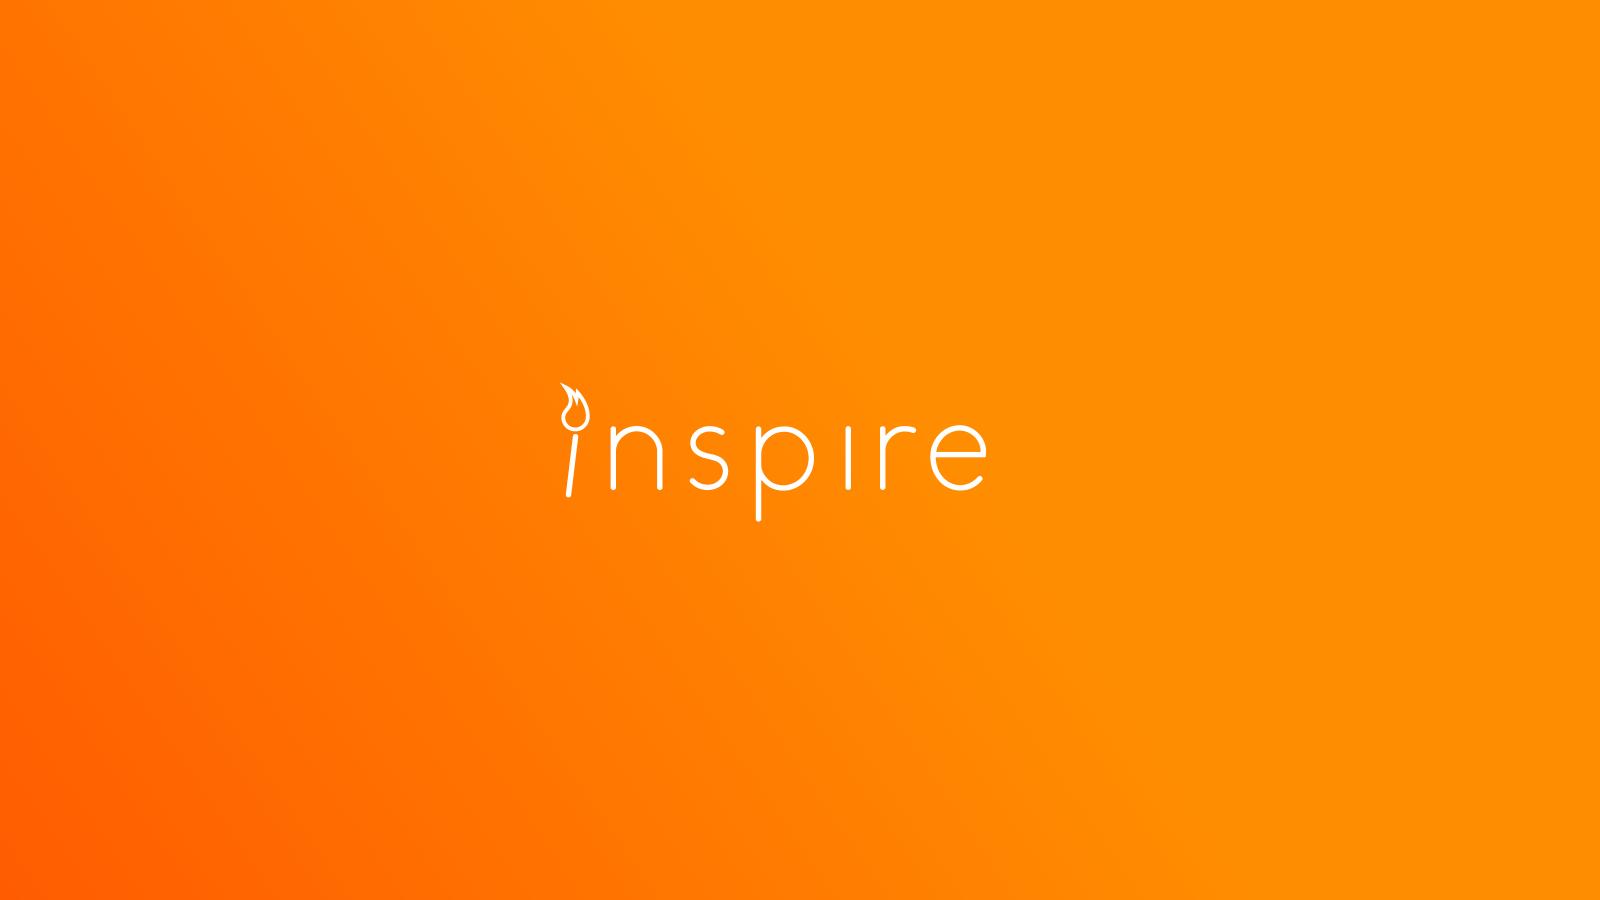 inspire-logo-8